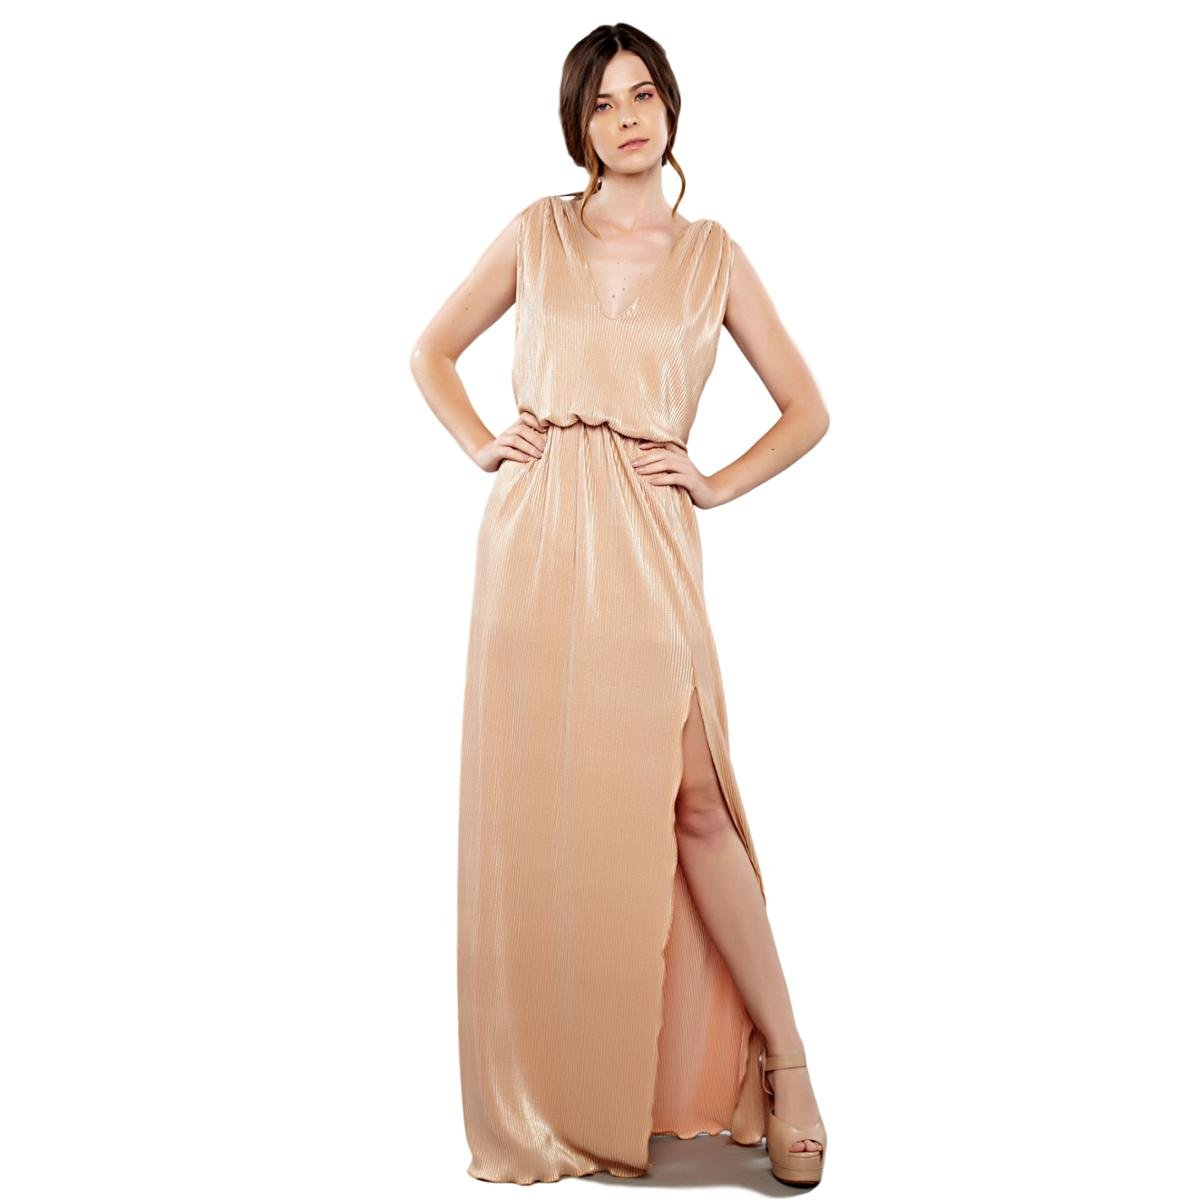 Vestido Longo Izadora Lima Brand Em Tecido Plissado Mettalic Feminino Nude